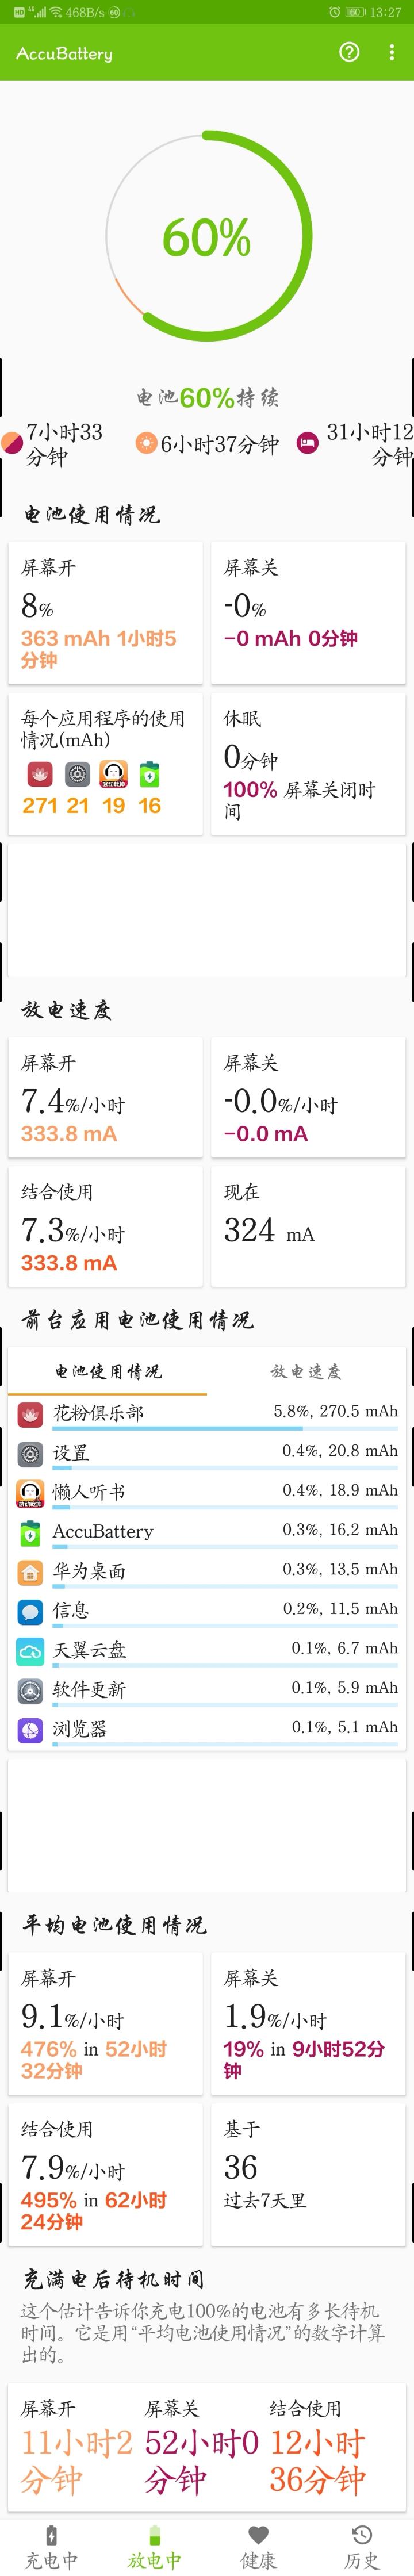 %2Fstorage%2Femulated%2F0%2FPictures%2FScreenshots%2FScreenshot_20190202_132700_.jpg